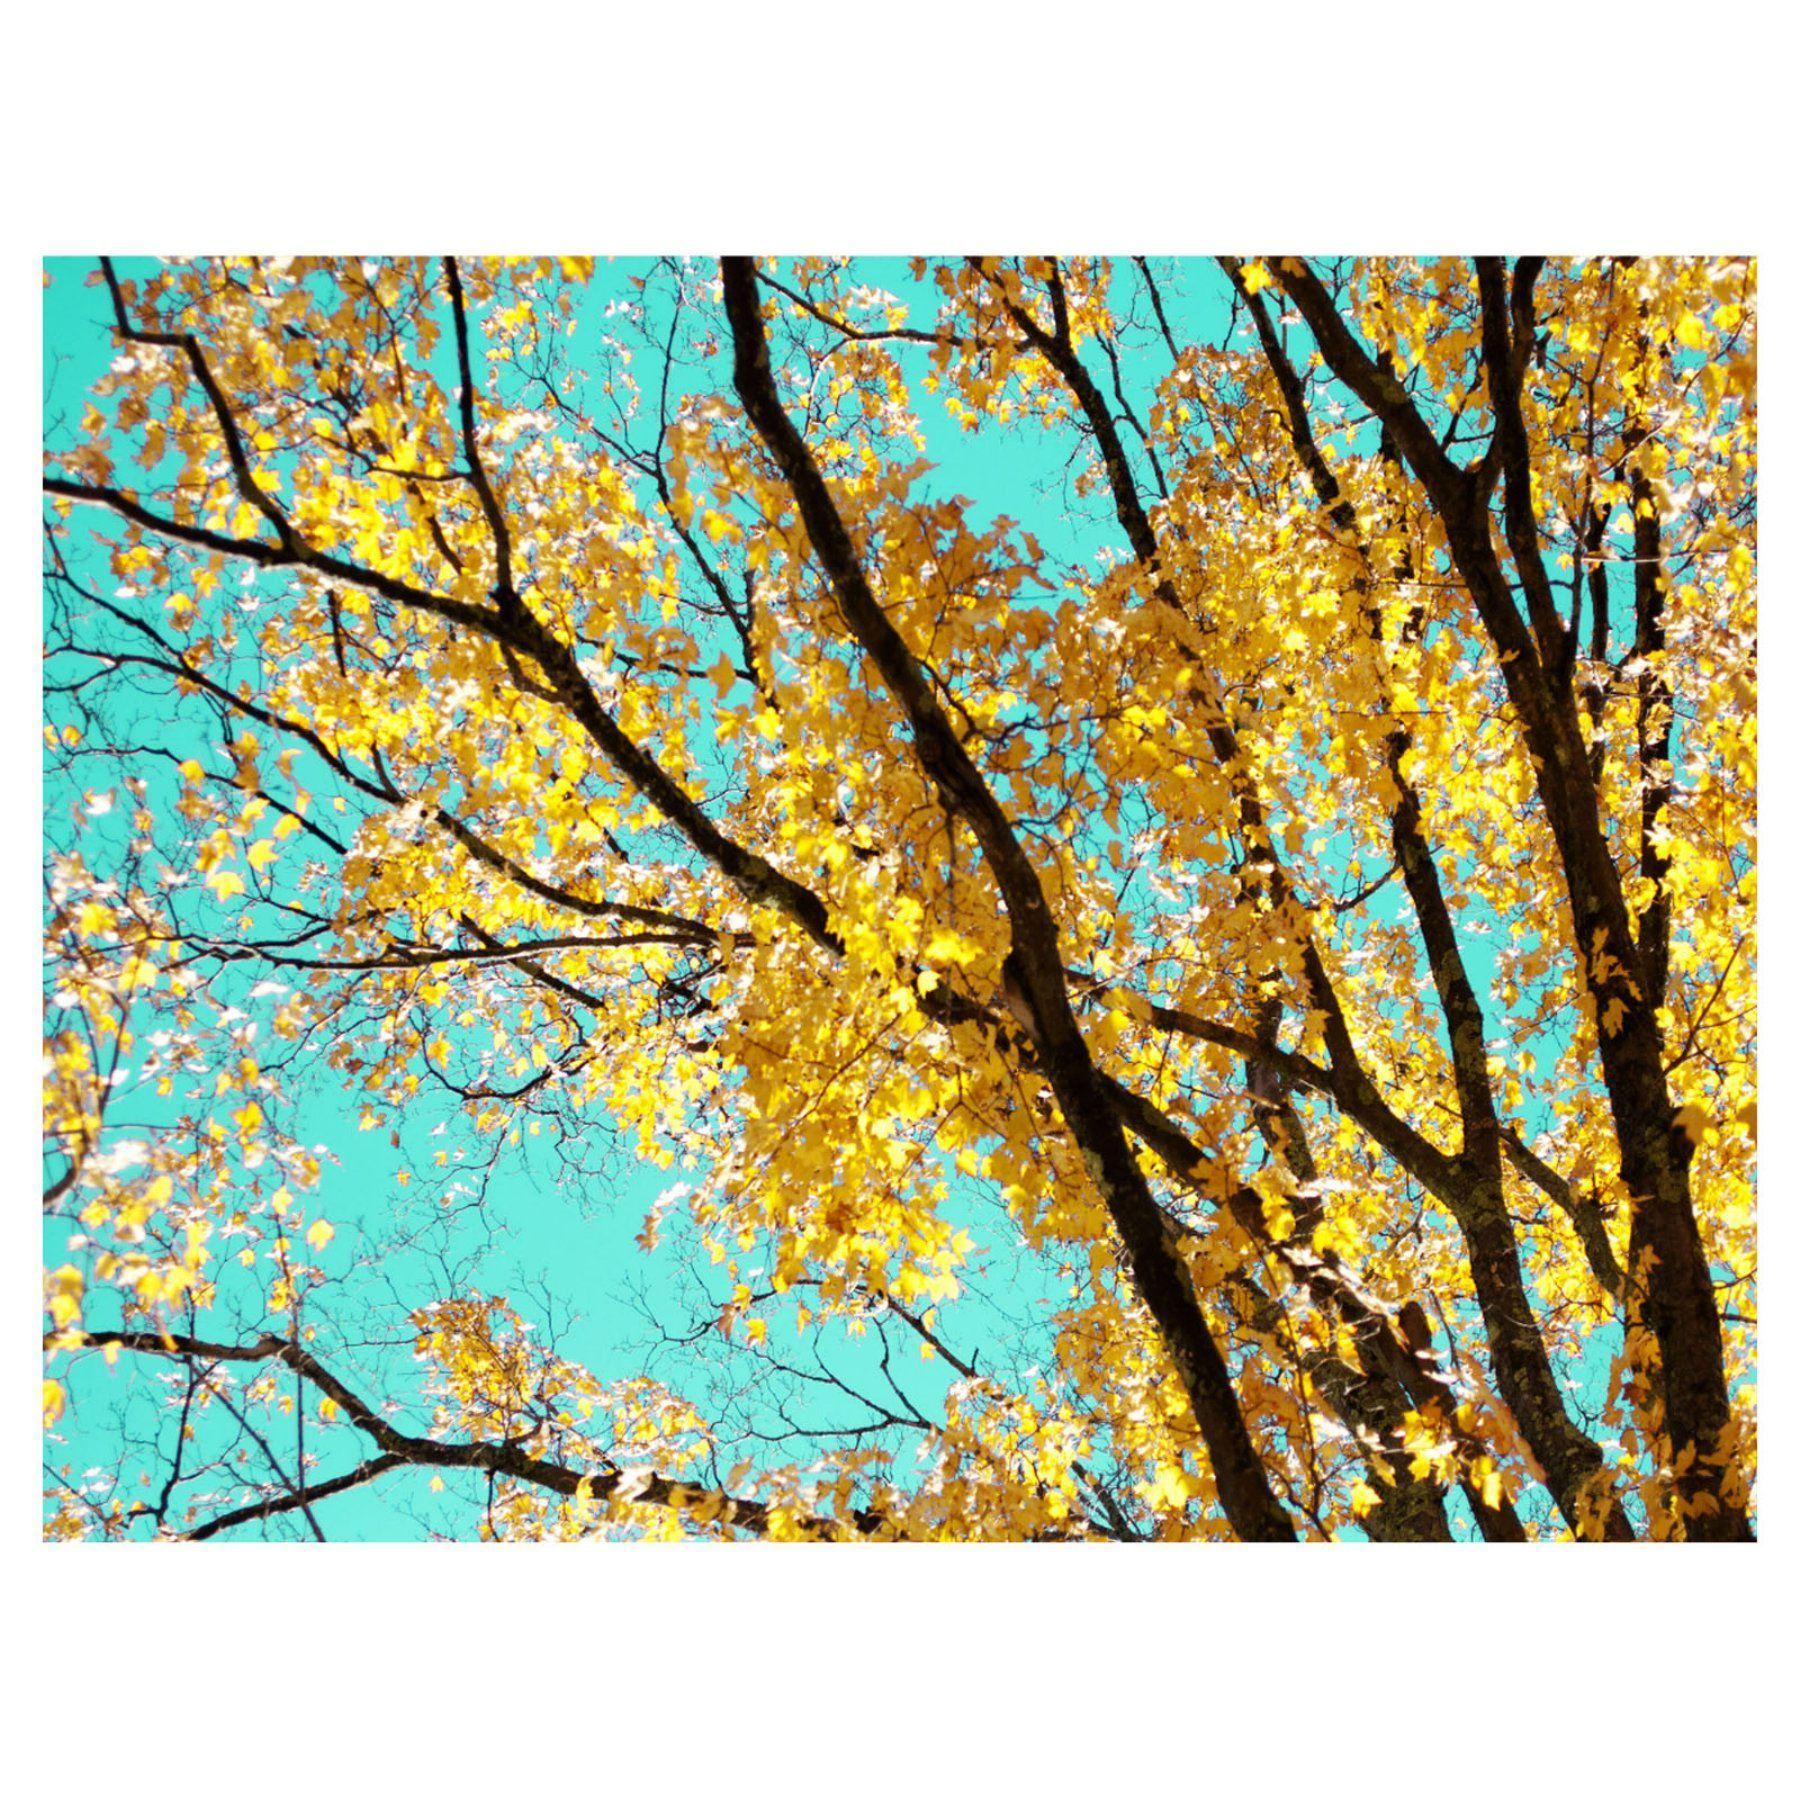 Courtside Market Autumn Tapestry IV Wall Art - WEB-LS182-16X20